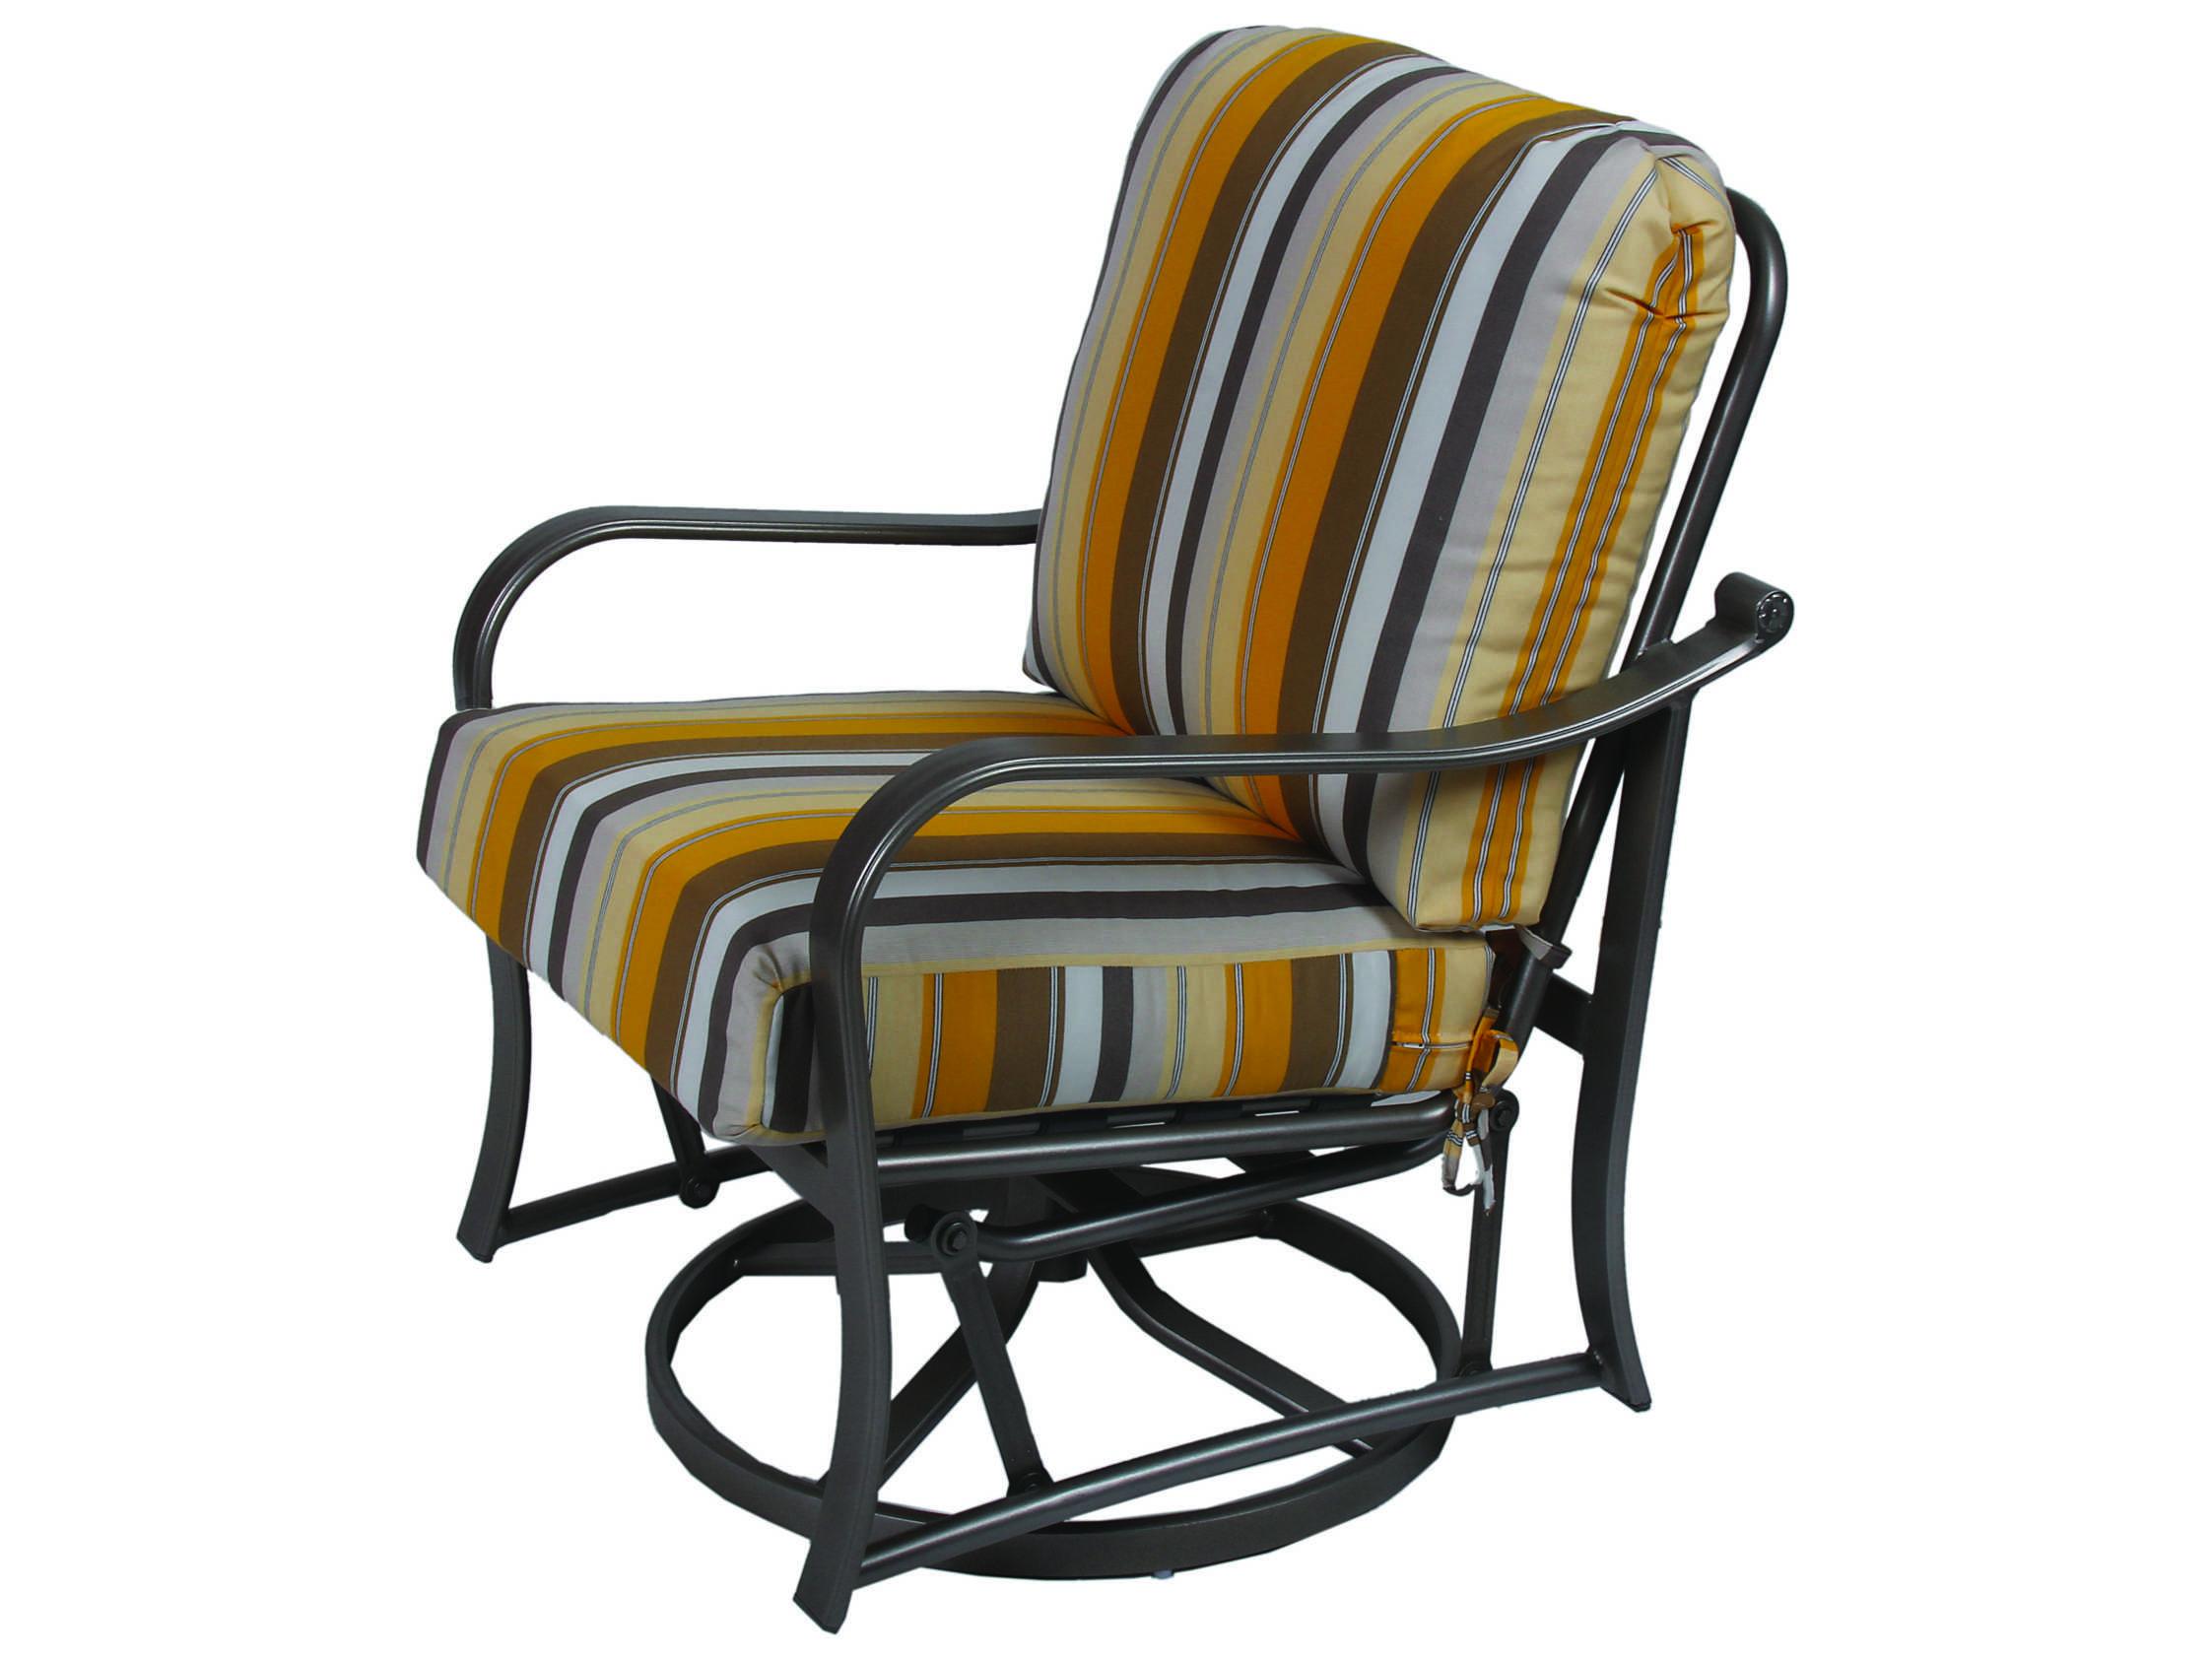 Suncoast Rosetta Cast Aluminum Swivel Glider Lounge Chair ...